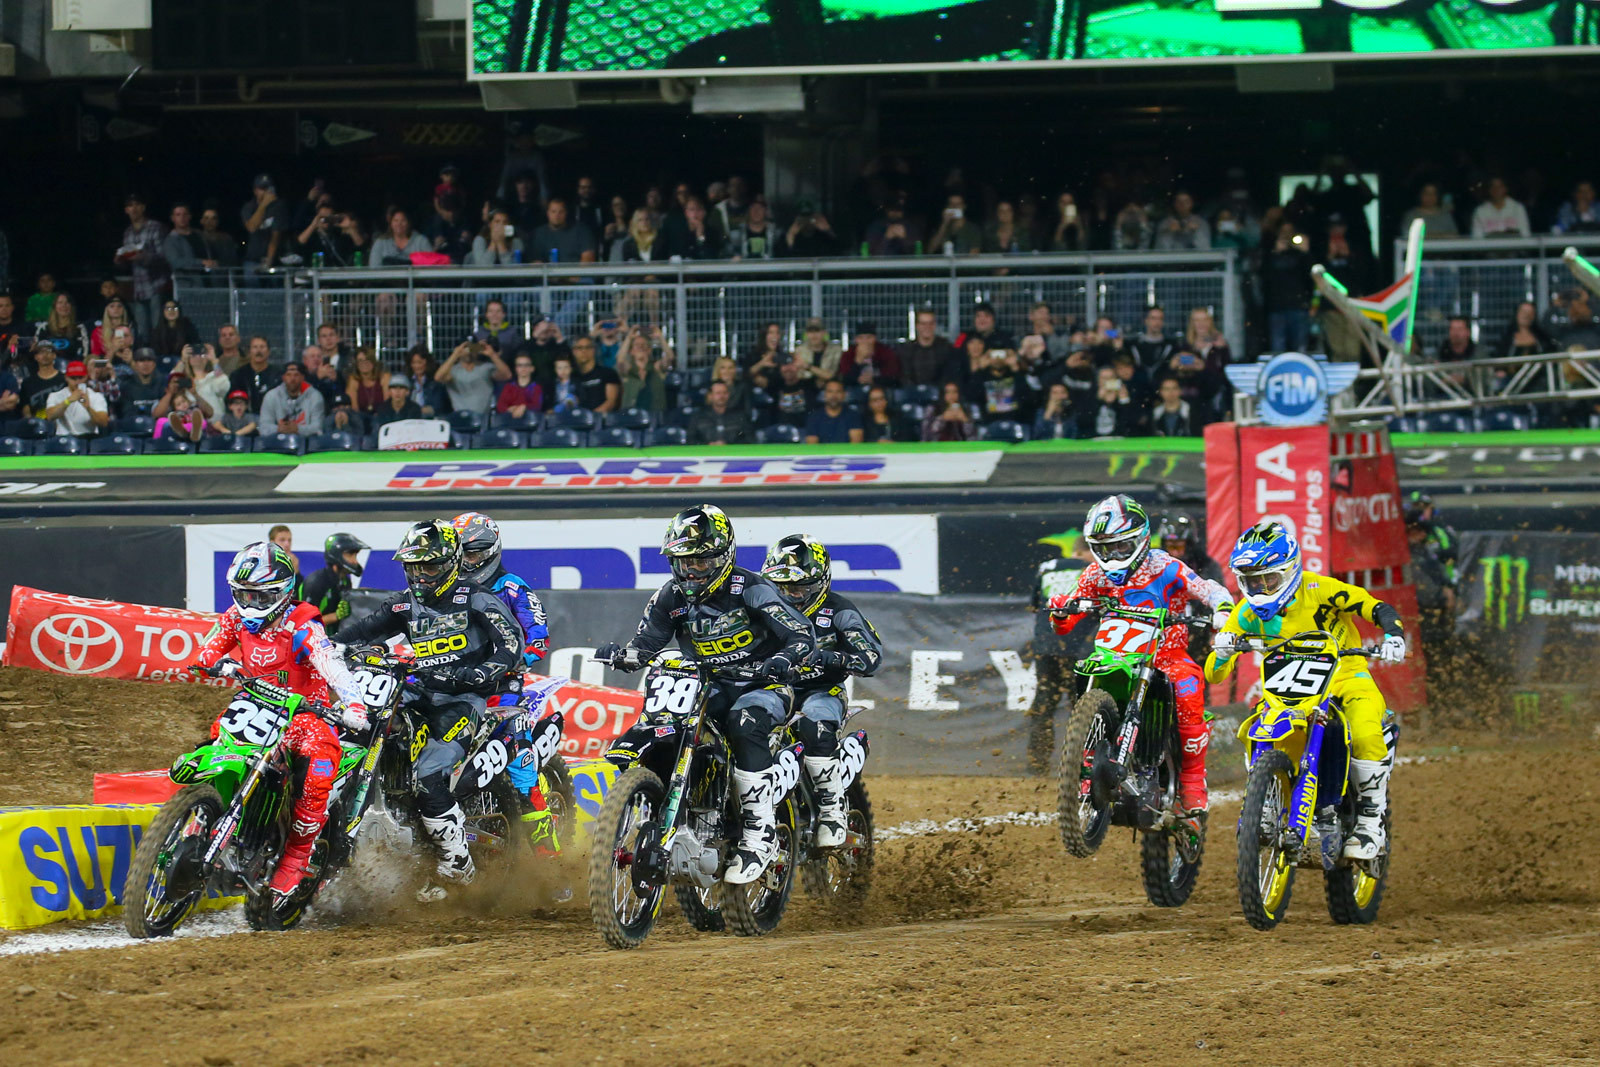 250 Heat One Start - Photo Blast: San Diego 2 - Motocross Pictures - Vital MX